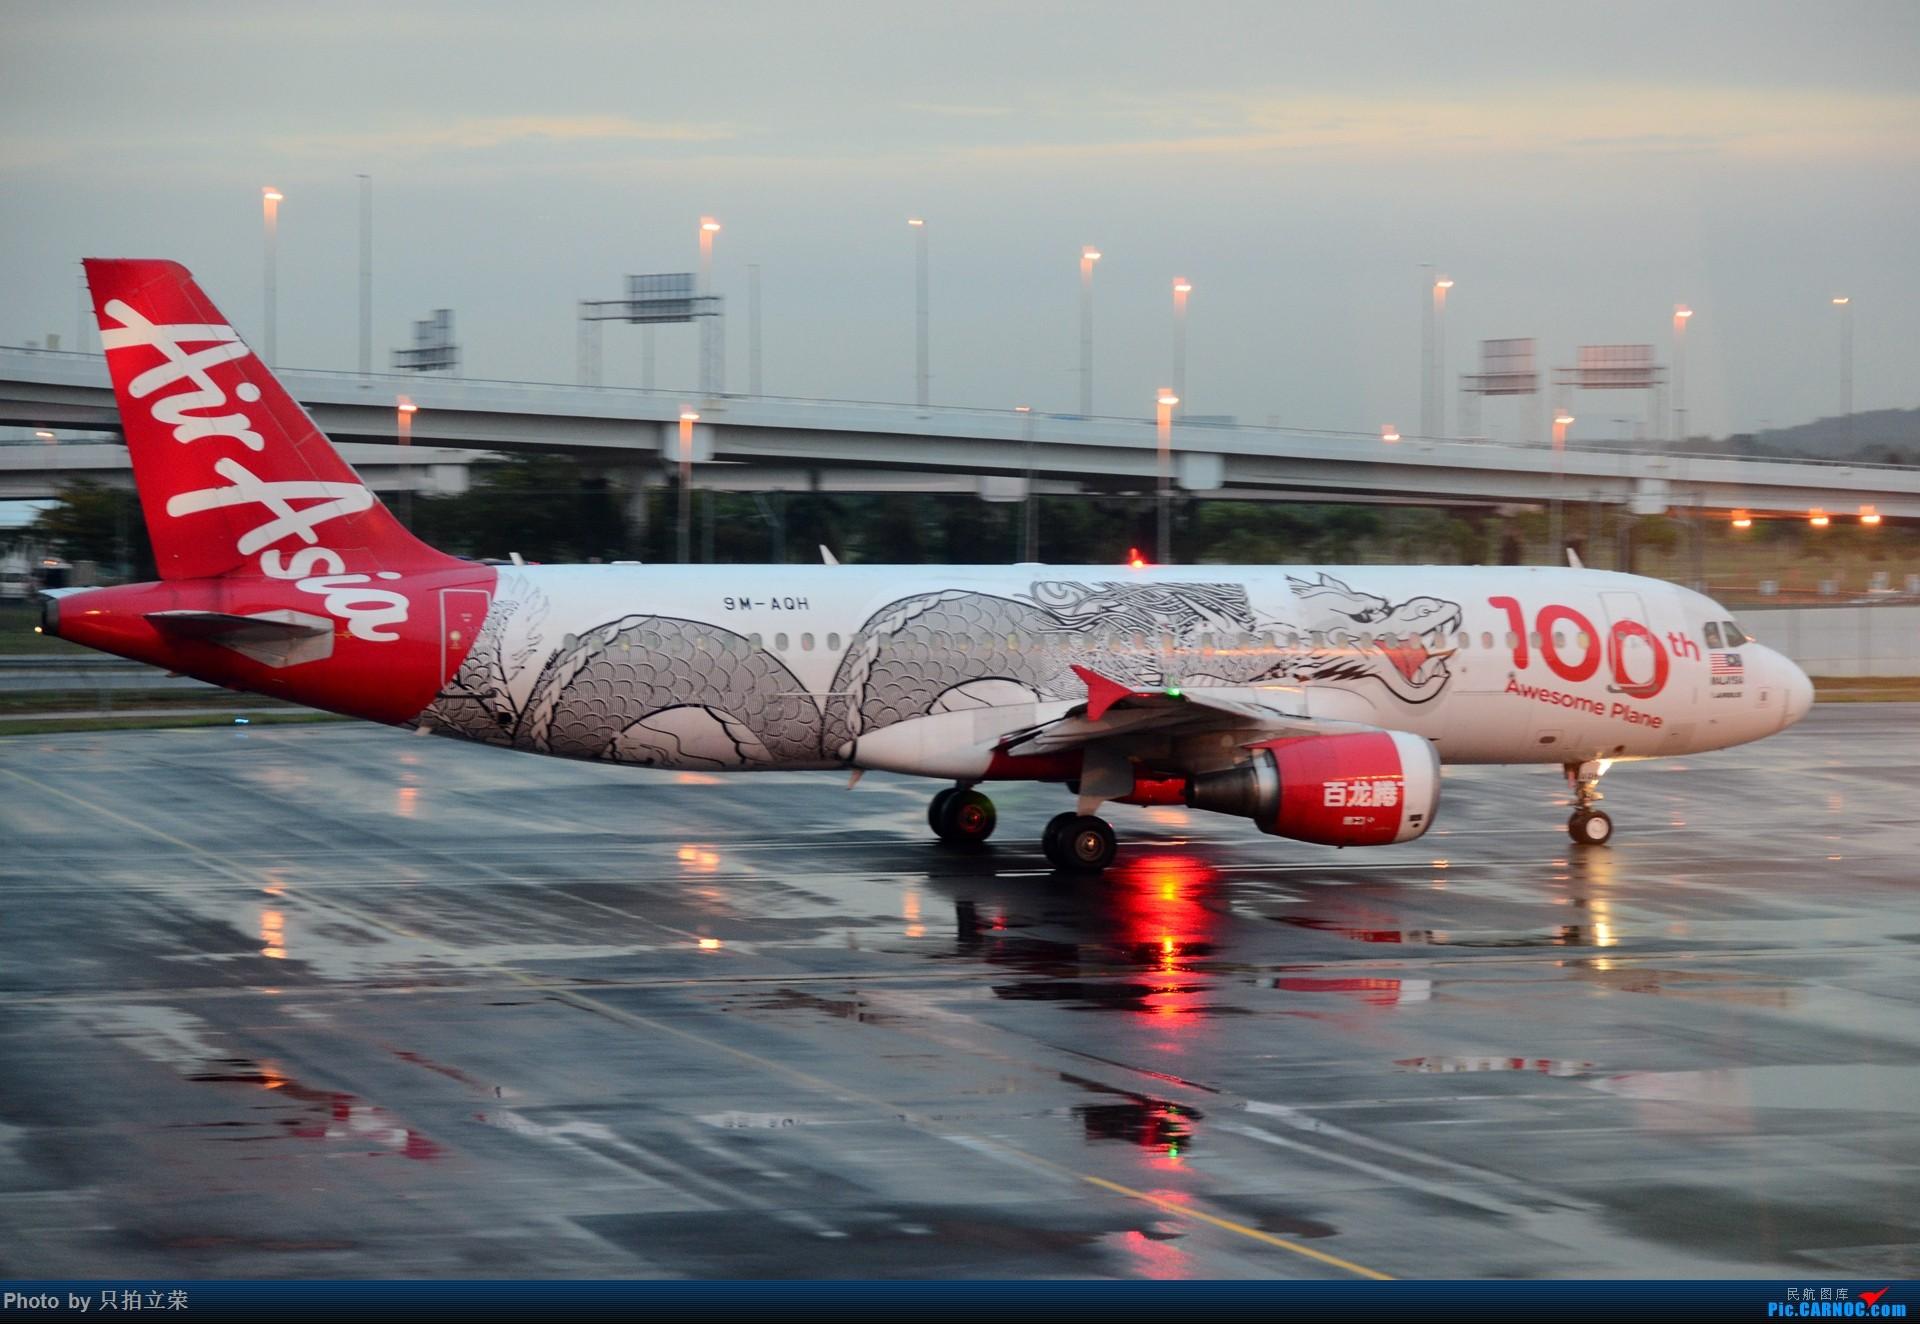 Re:[原创]湖南飞友会:只拍立荣回归。马来之旅航站楼杂图一堆。 AIRBUS A320 9M-AQH 马来西亚吉隆坡国际机场